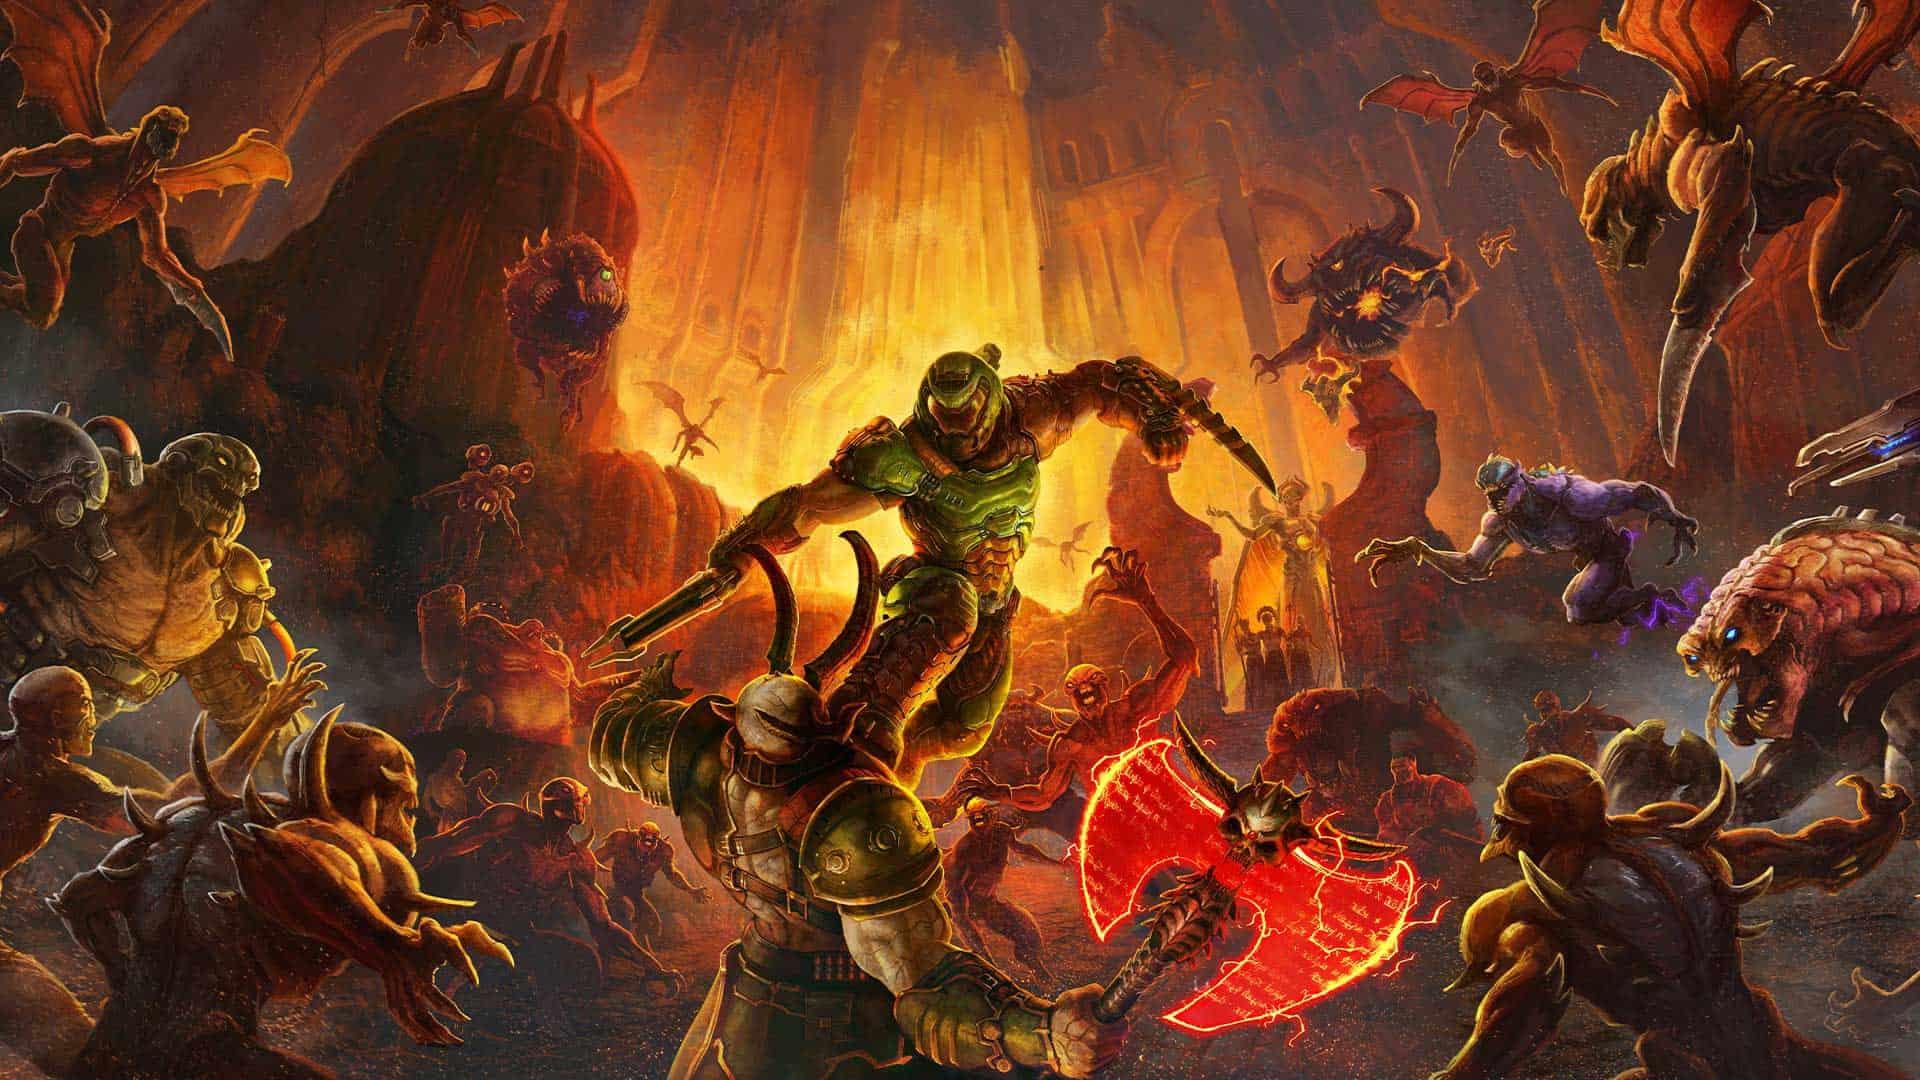 Doom Eternal Denuvo Nexus Retail Microtransactions 2020 Video game Releases